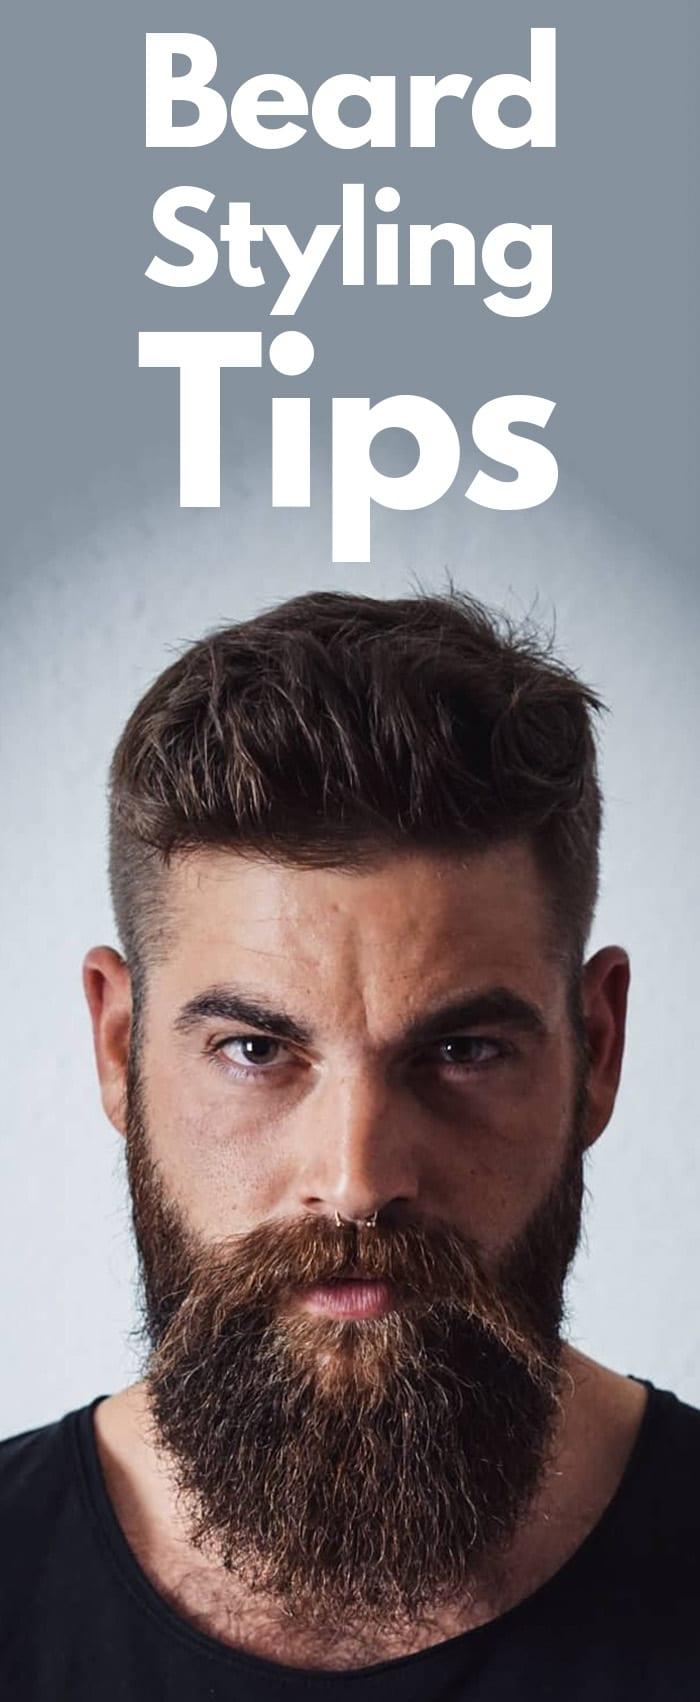 Beard Styling Tips.